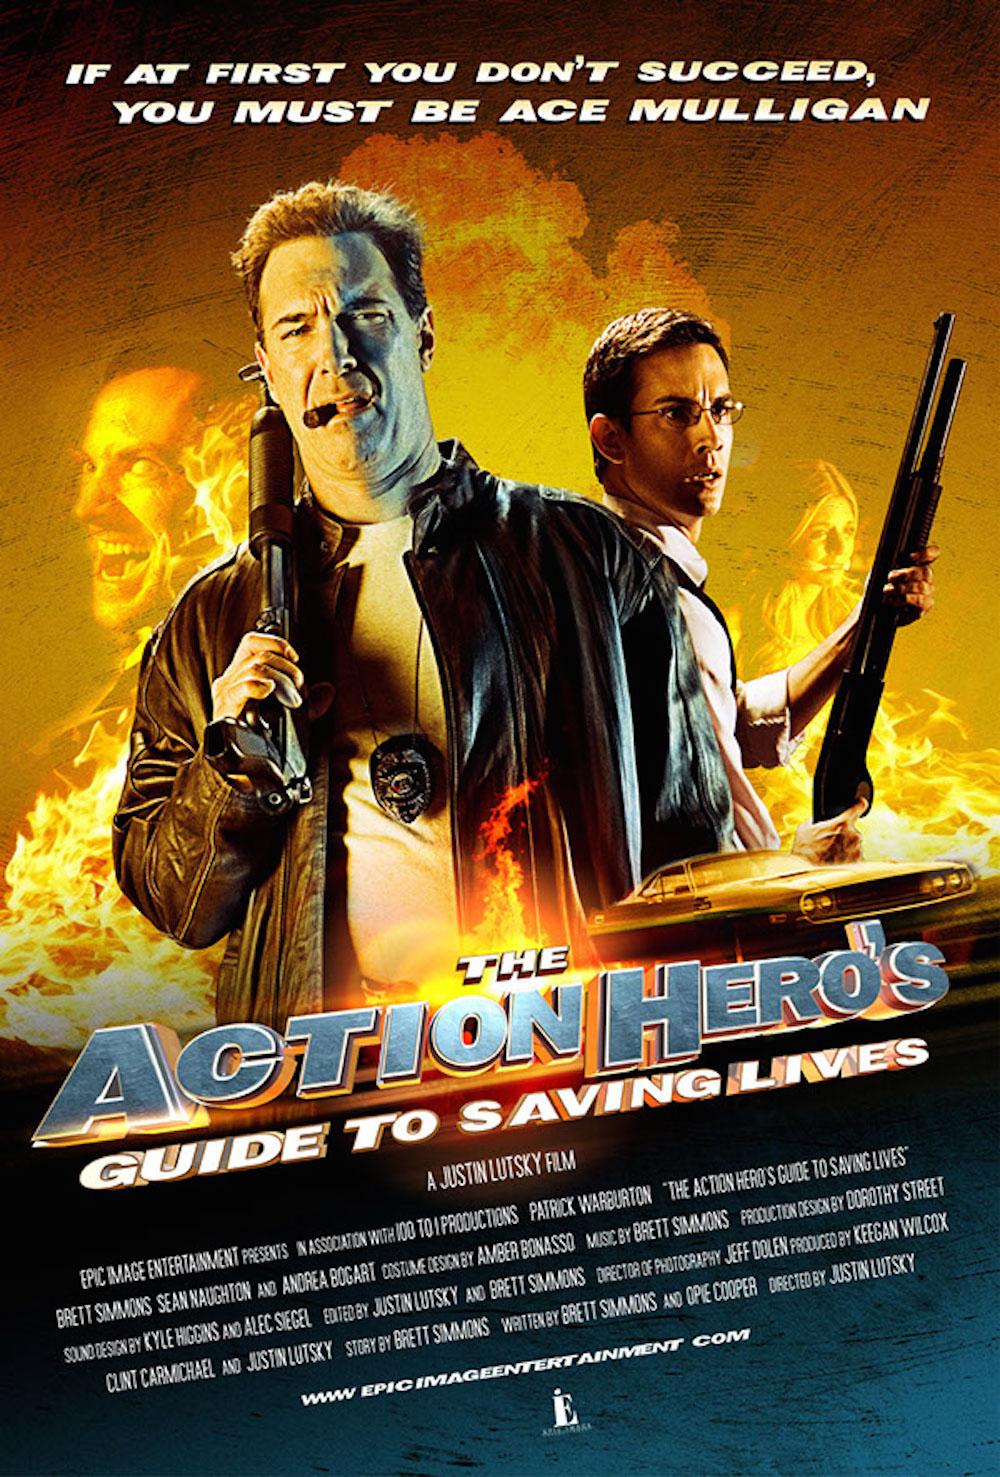 The Action Hero's Guide to Saving Lives - Cortometraggio